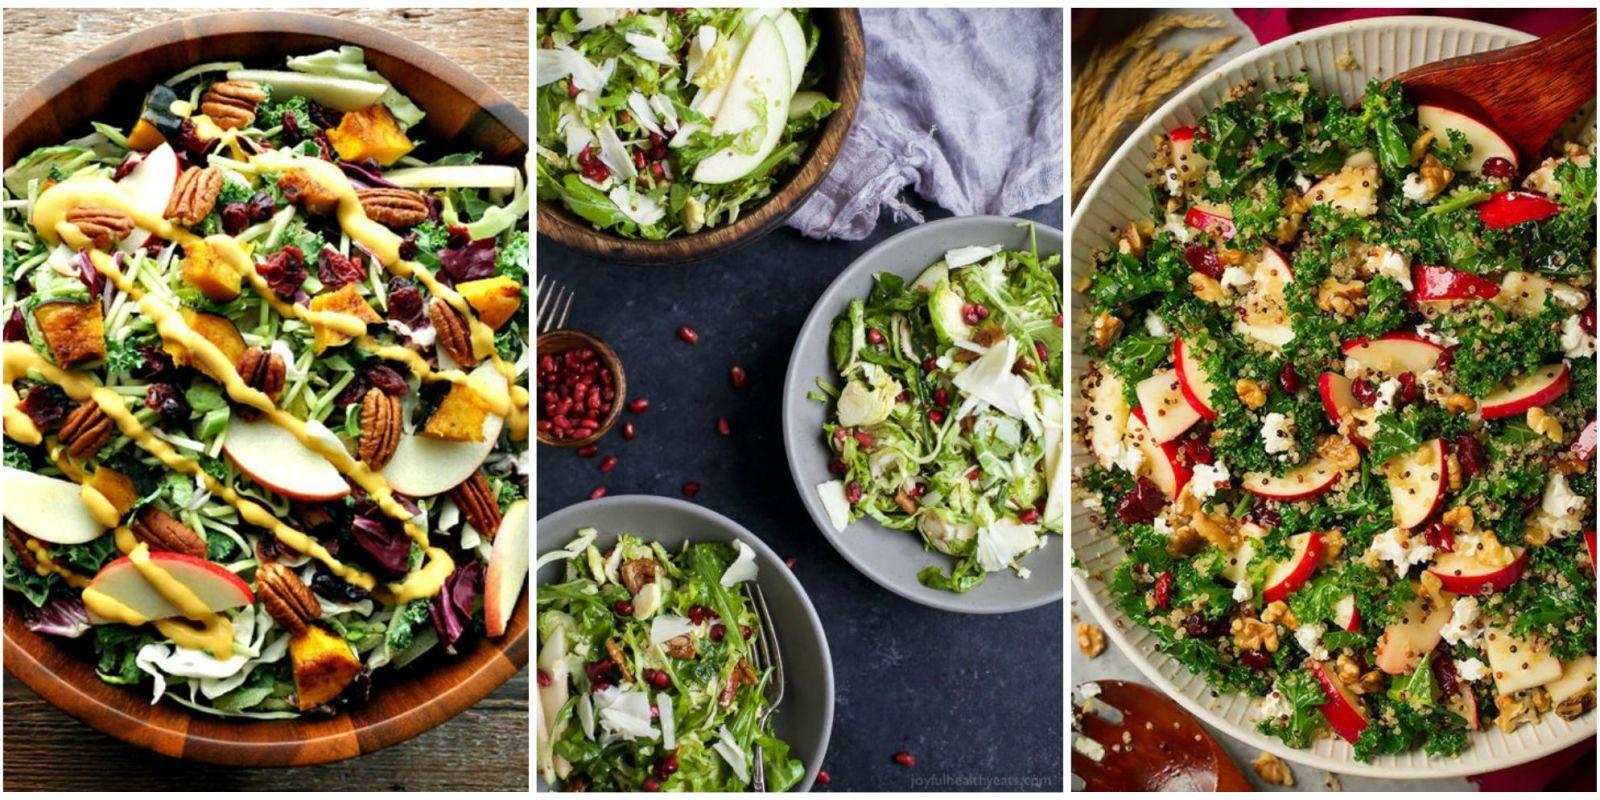 Salad For Thanksgiving Dinner  11 Easy Thanksgiving Salad Recipes Best Side Salads for